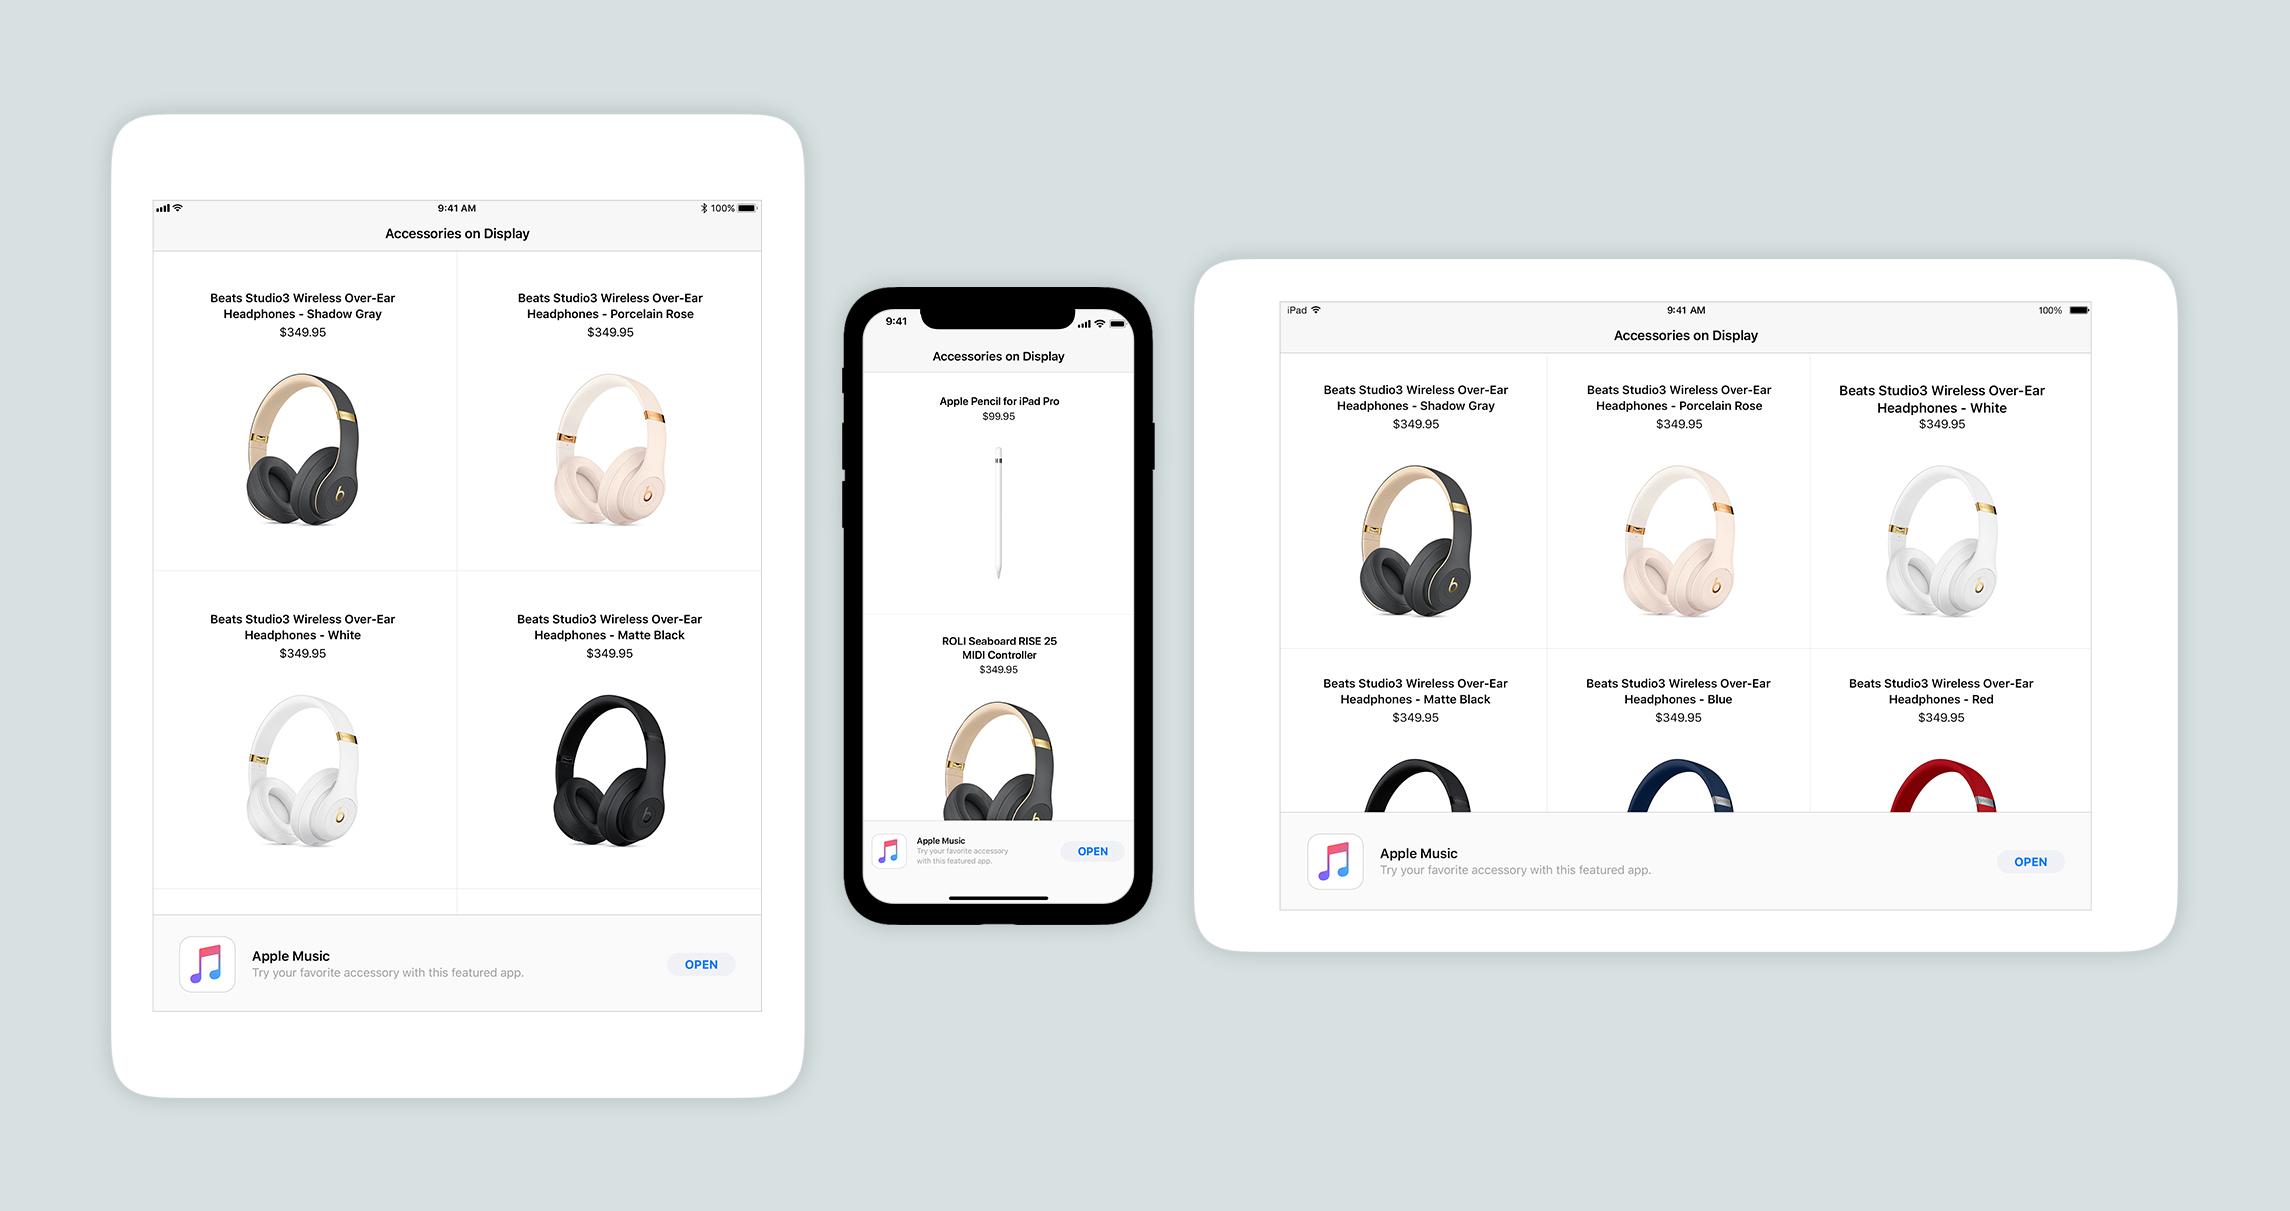 01-Accessories-PricingApp-Devices.jpg